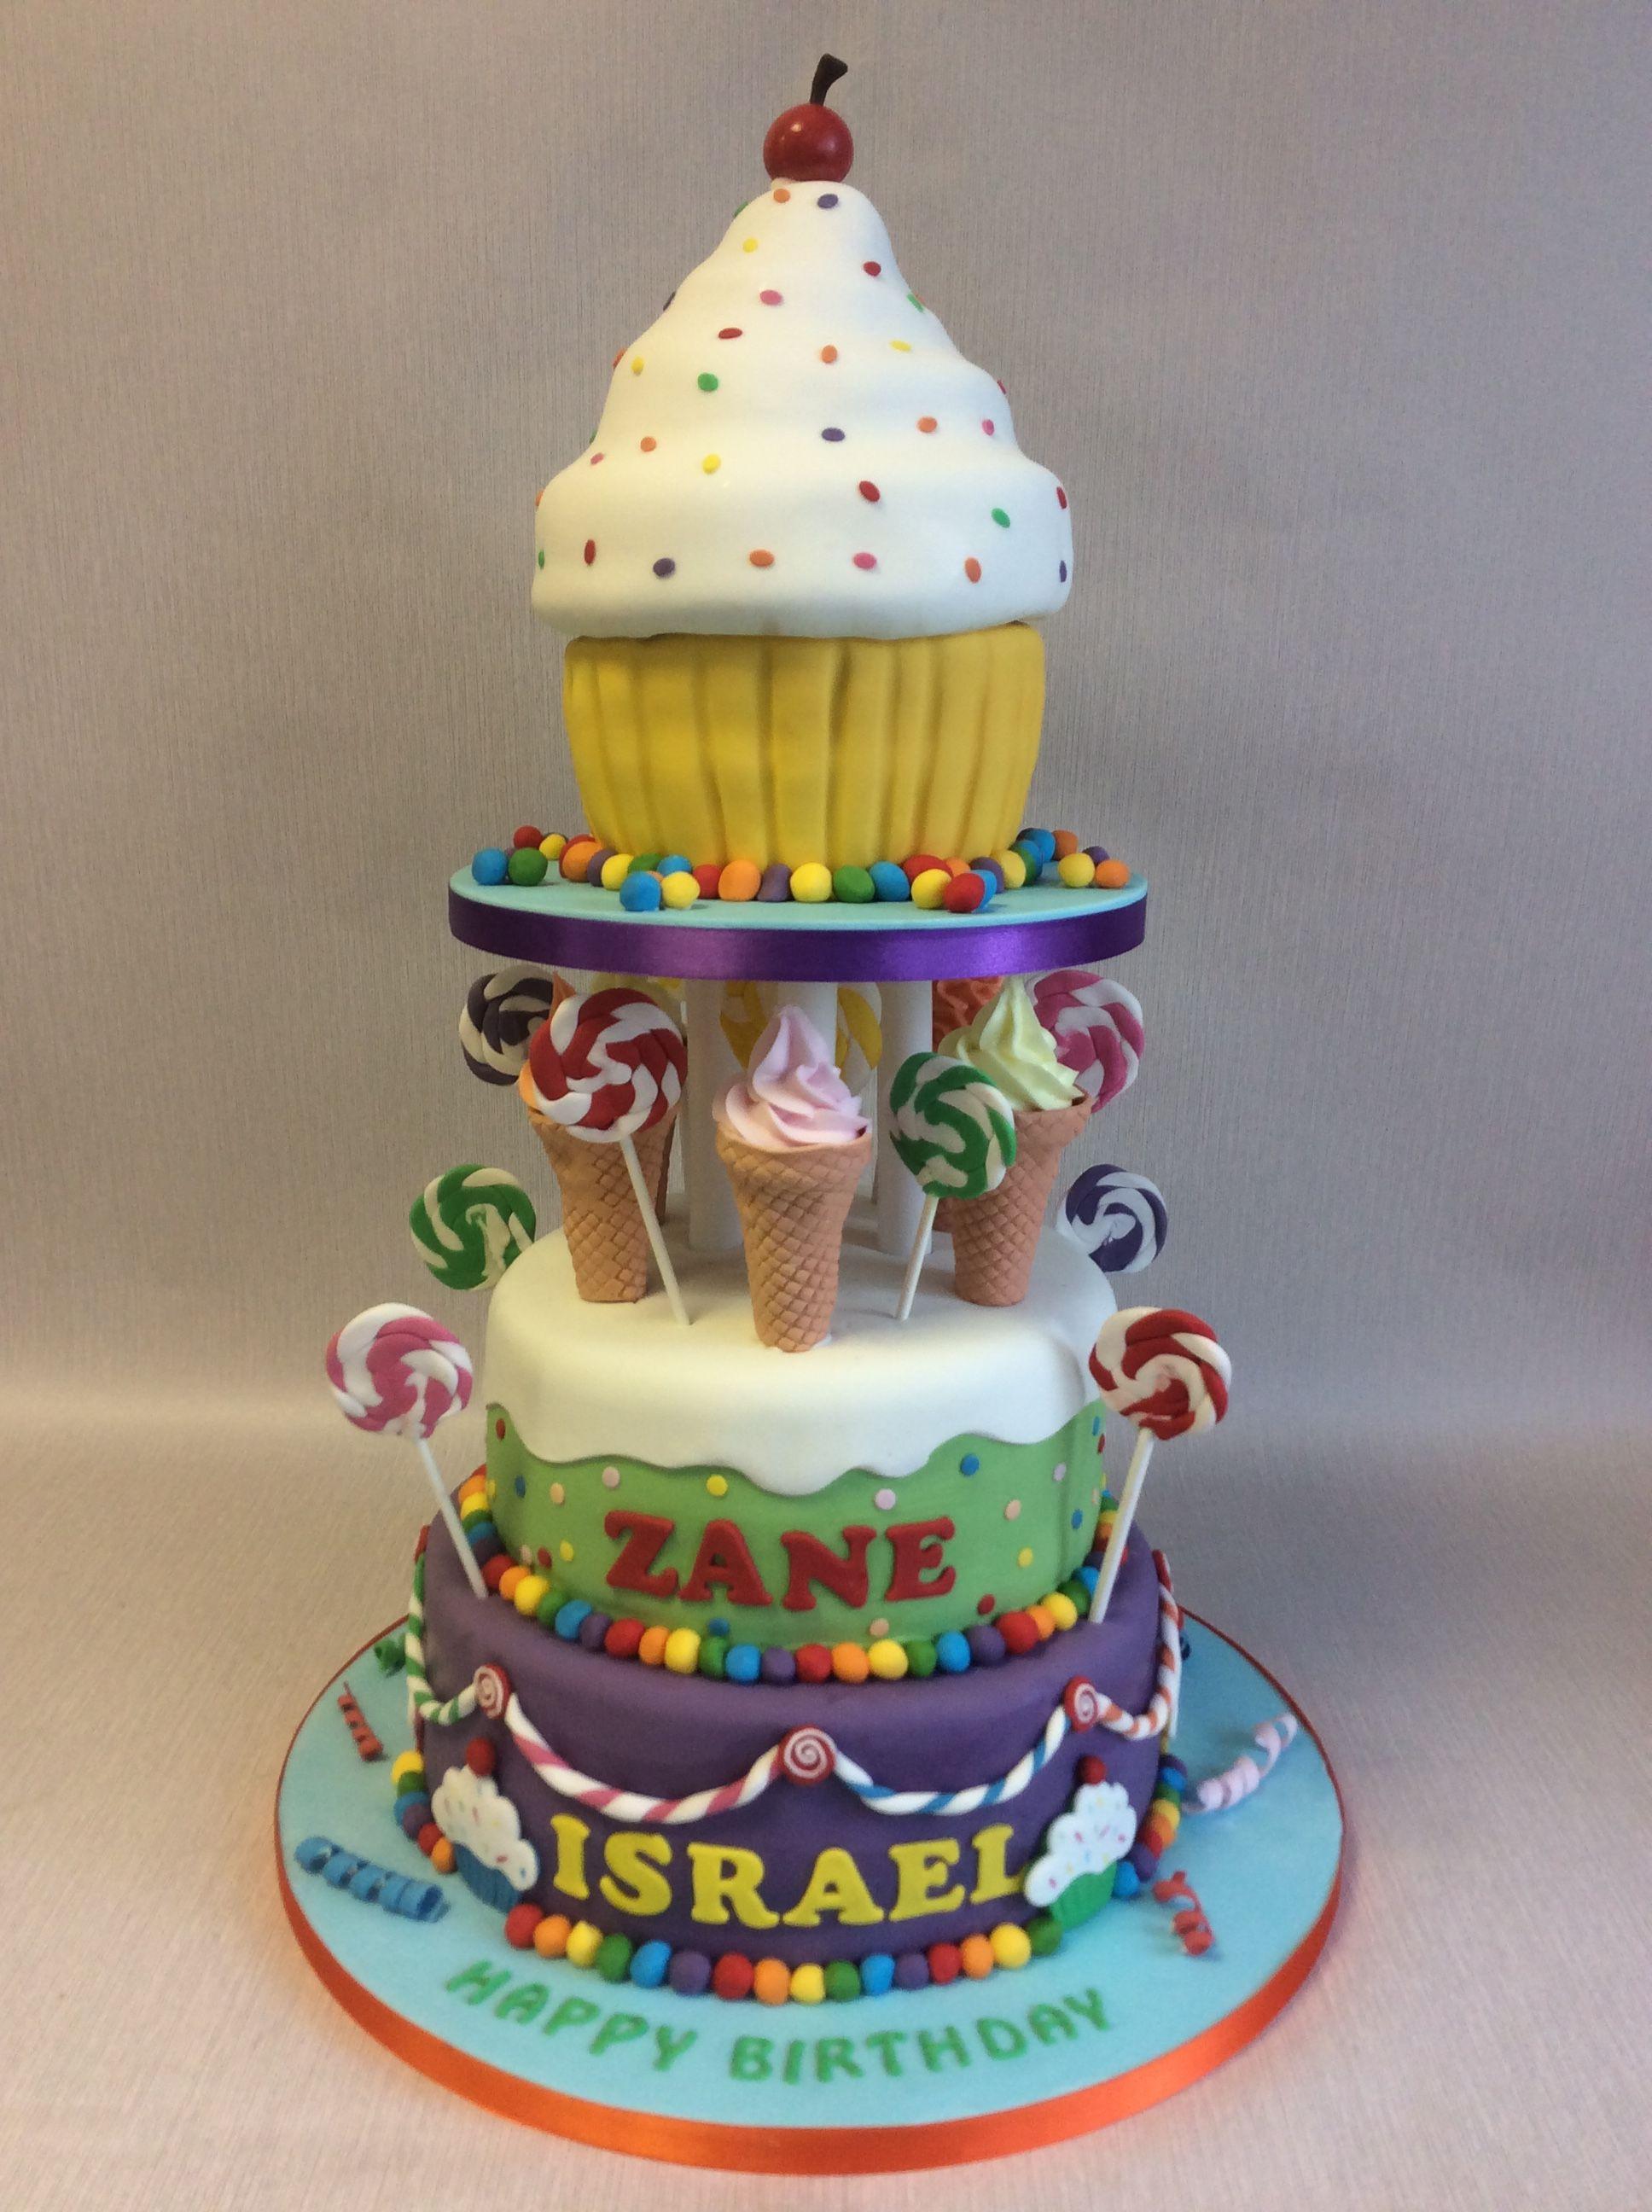 Extravagent 3 Tier Sweet Theme Birthday Cake Incorporating